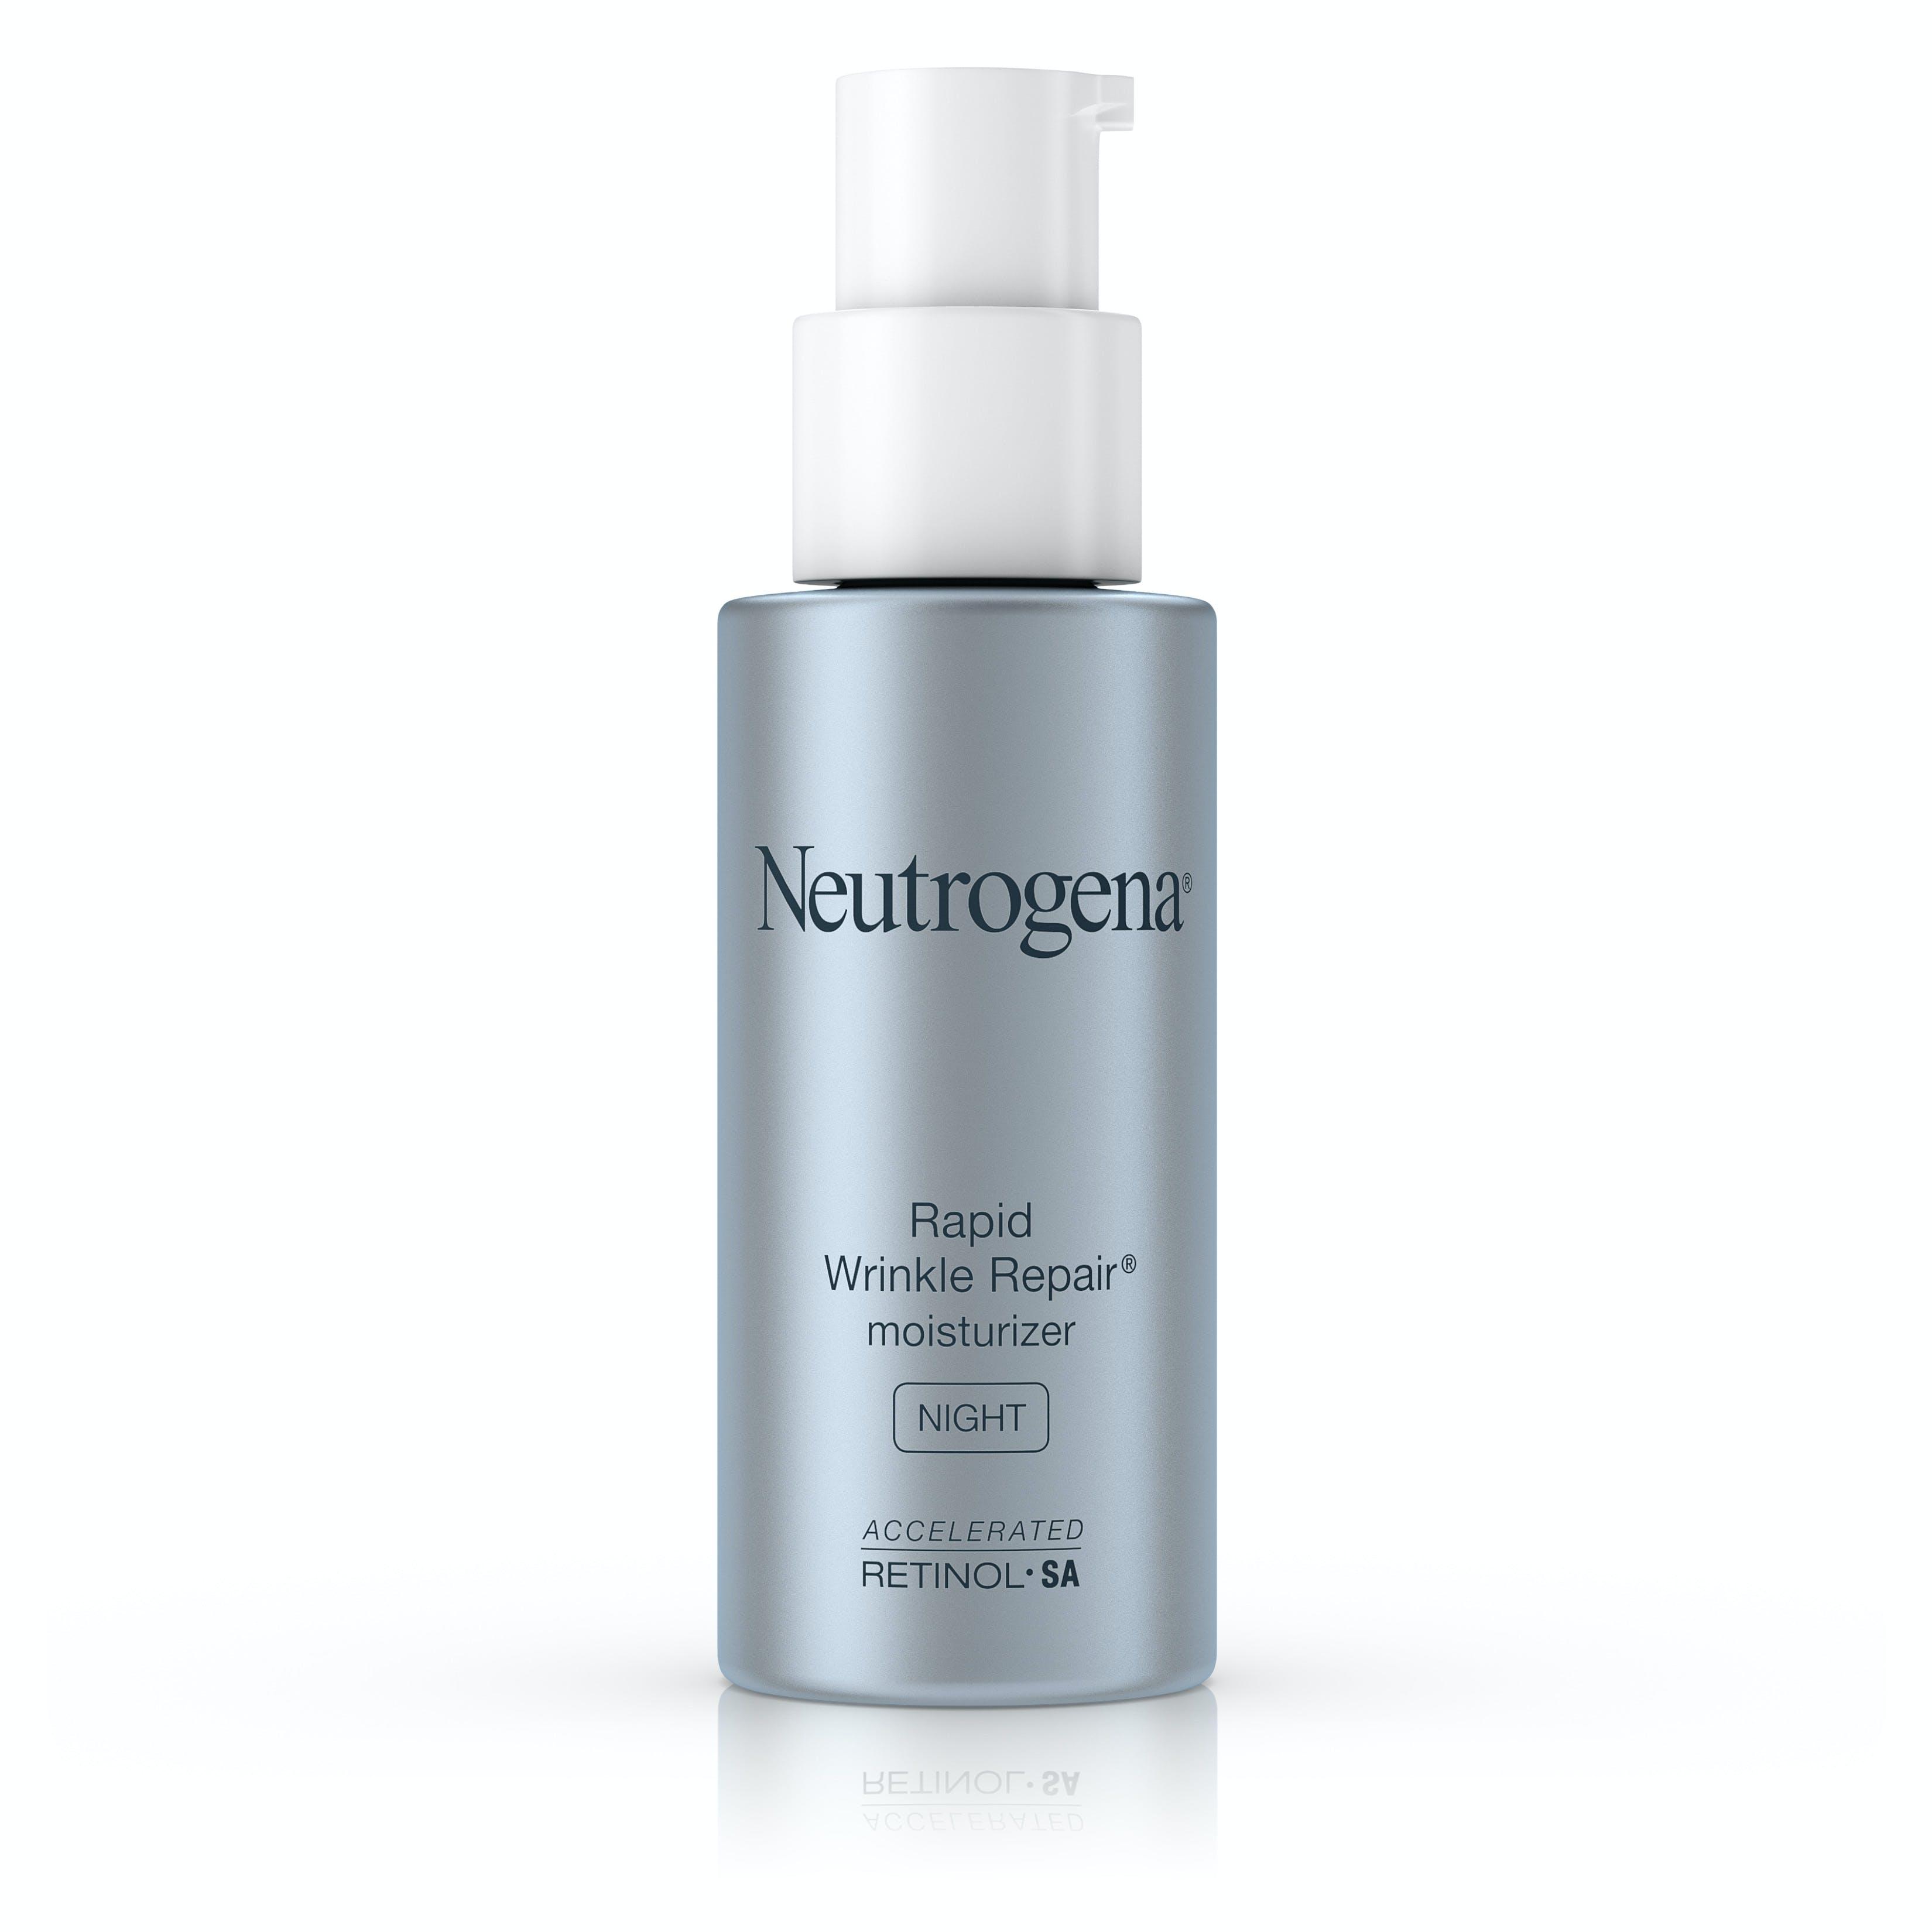 Neutrogena Rapid Wrinkle Repair Night Moisturizer With Retinol